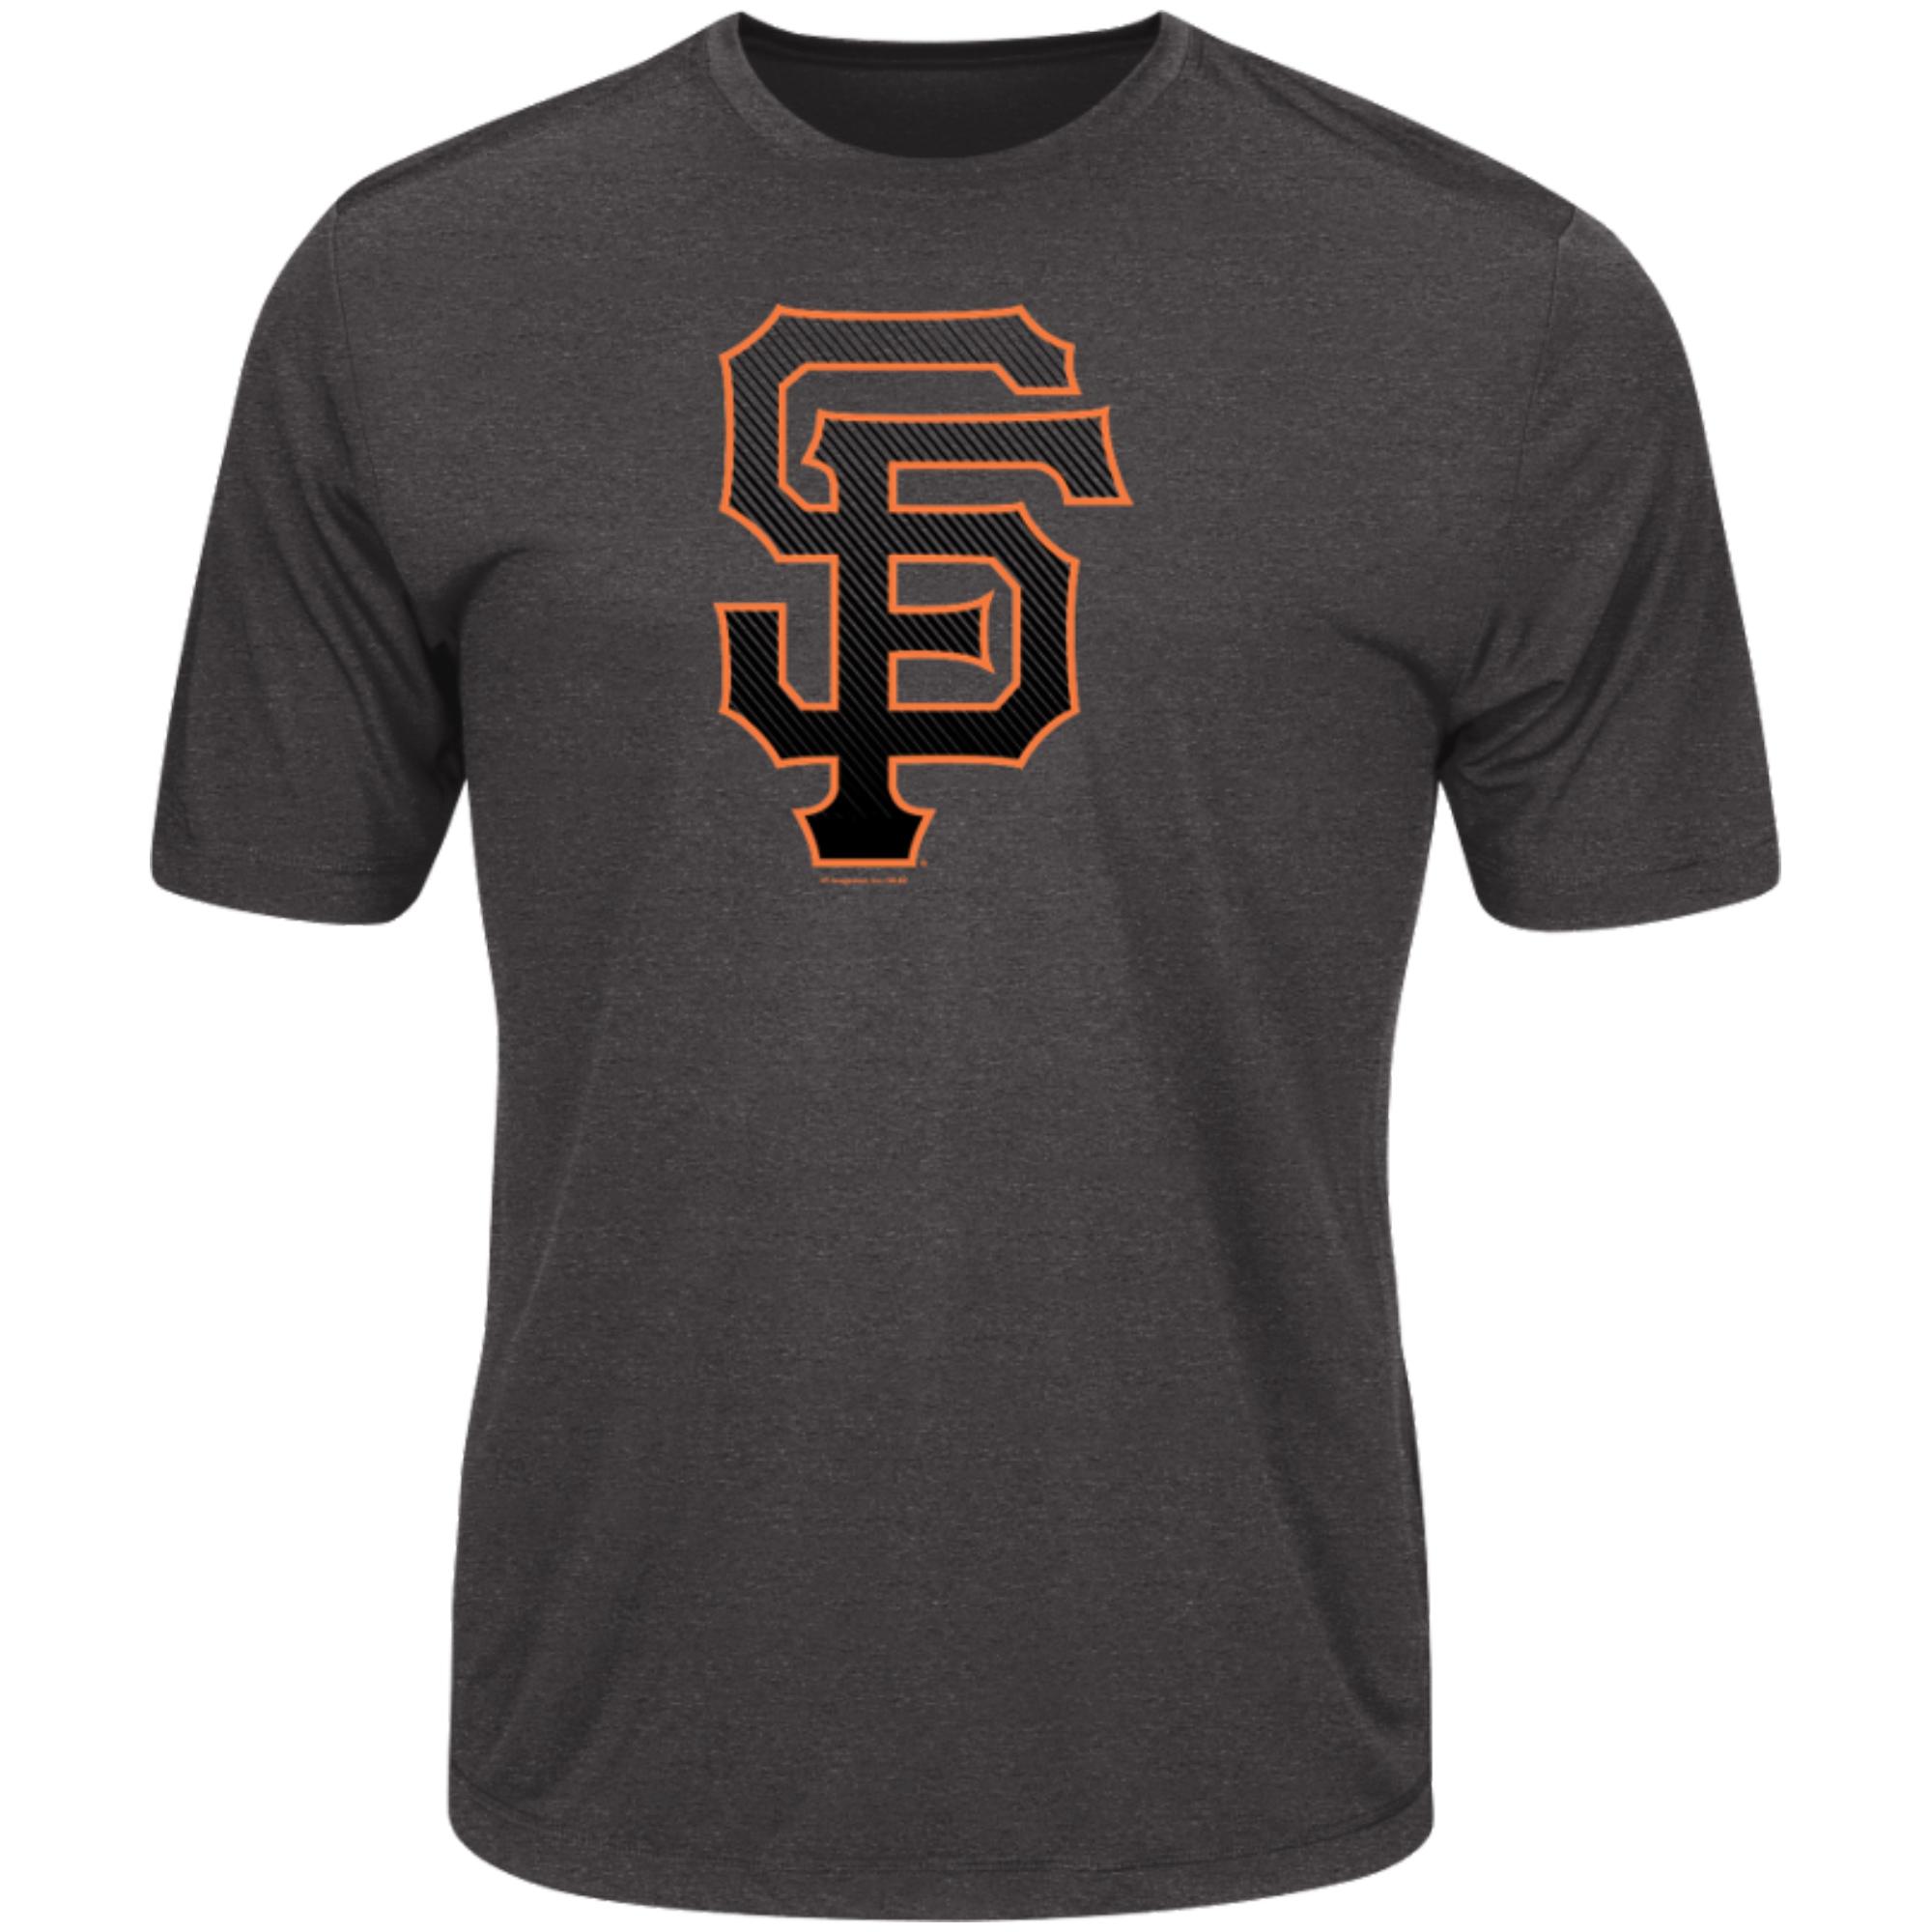 Men's Majestic Heathered Charcoal San Francisco Giants Logo Statement T-Shirt